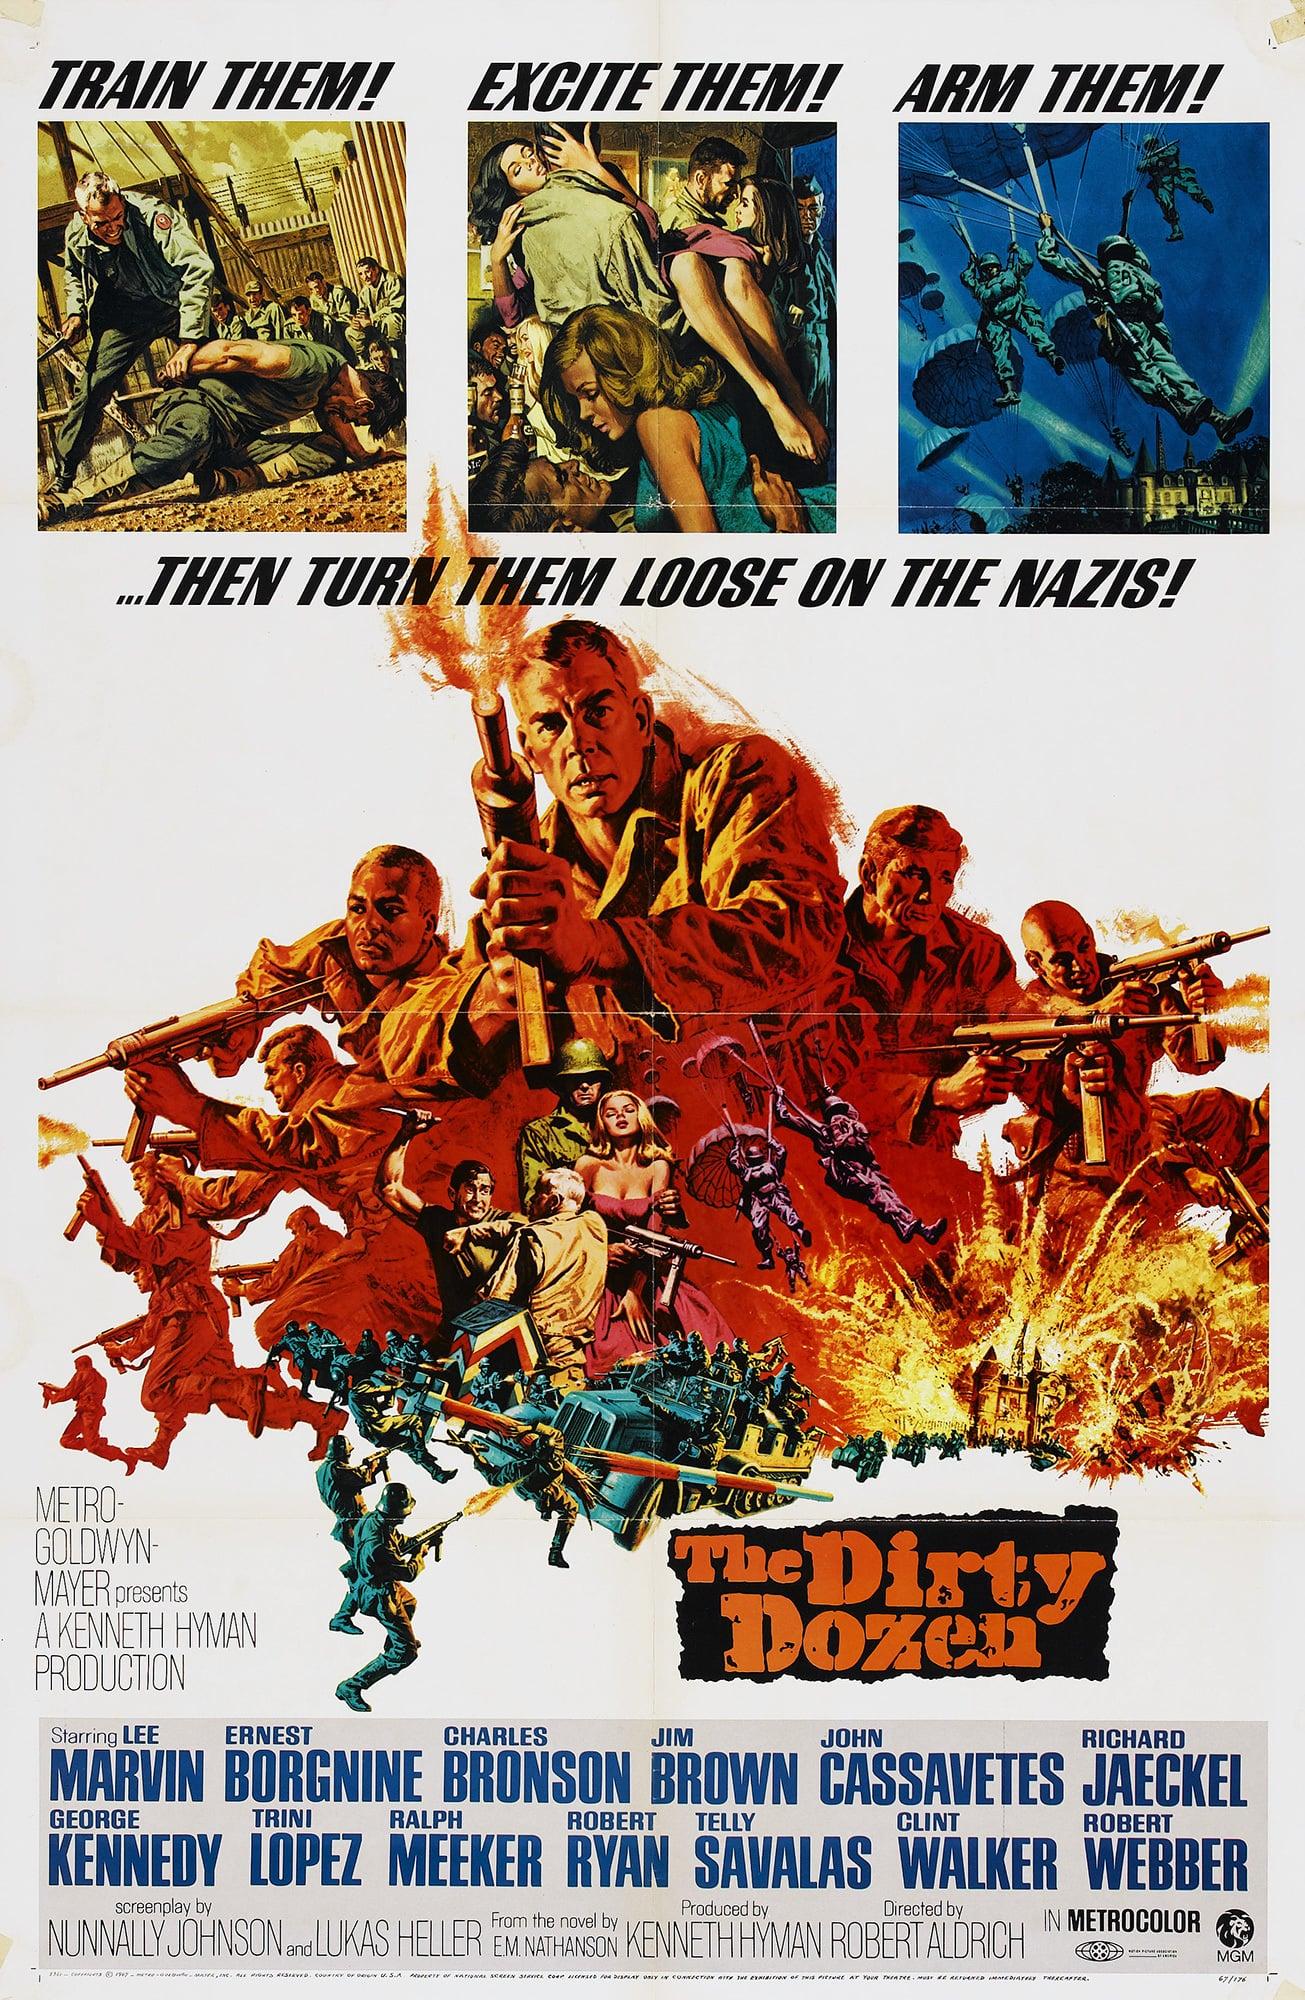 The Dirty Dozen poster